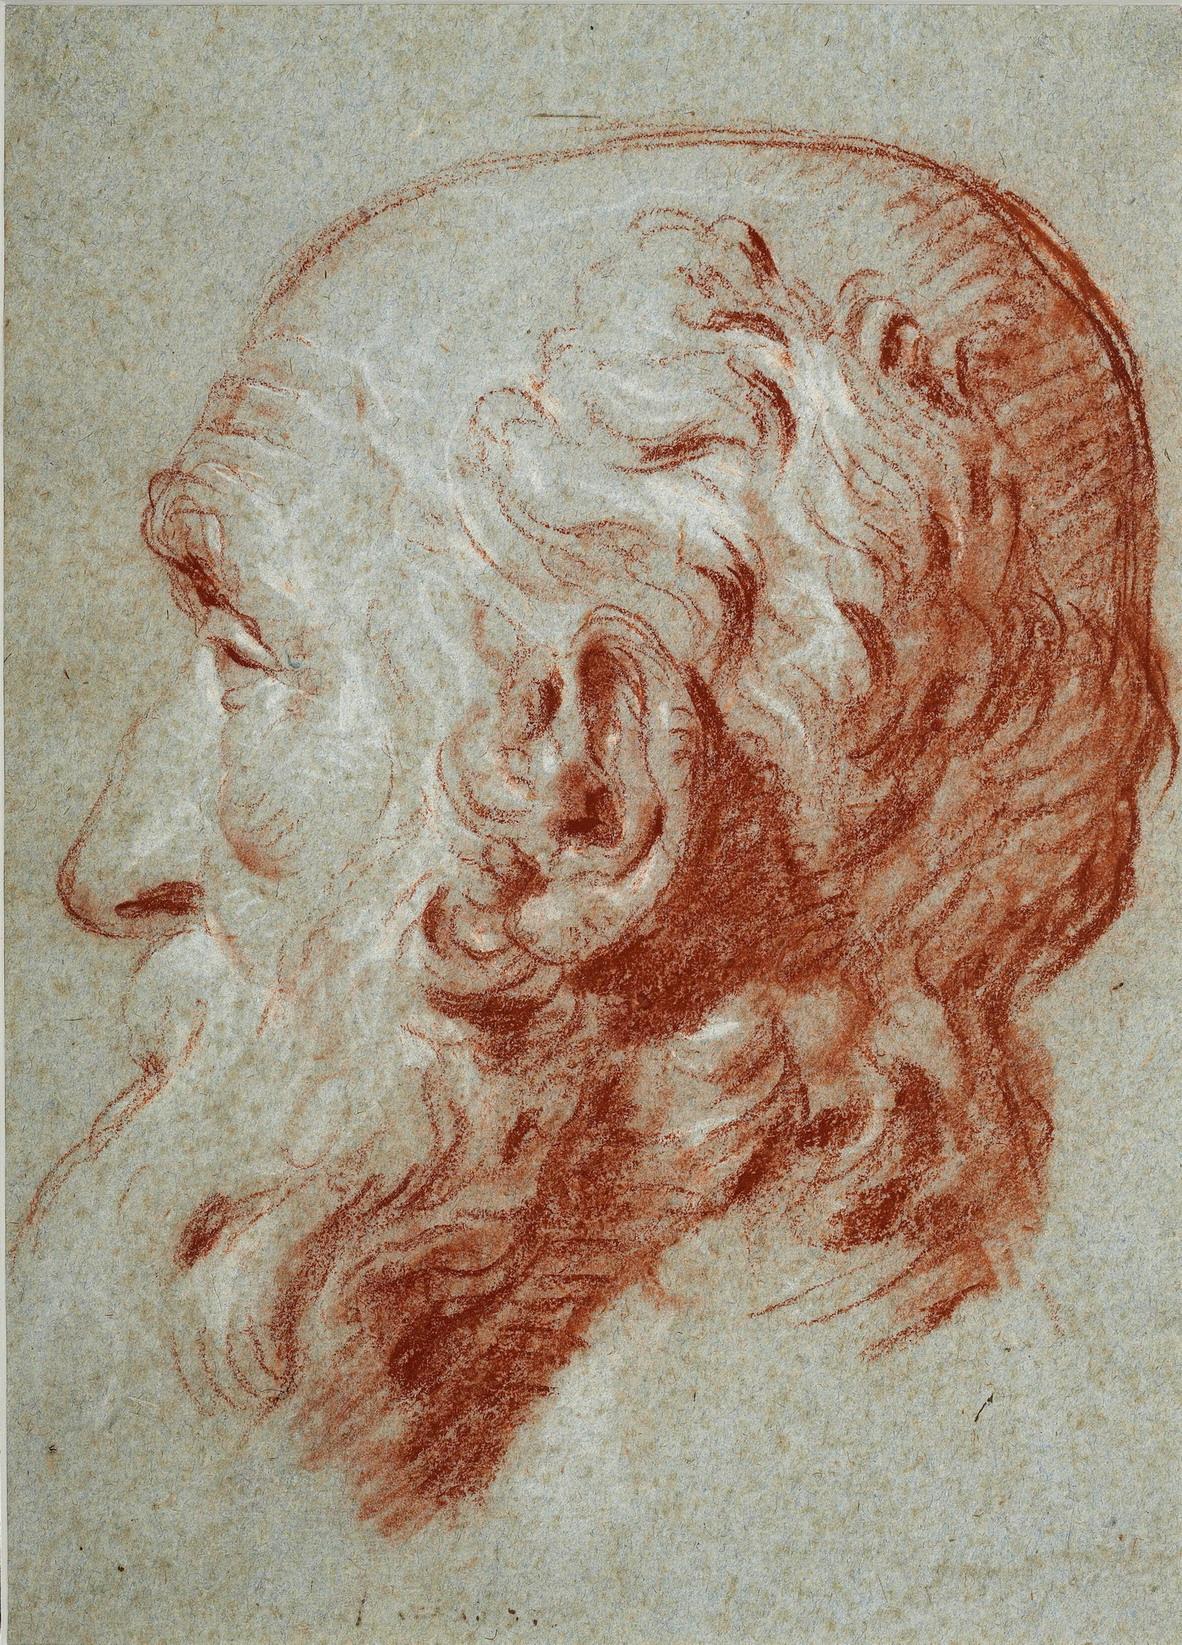 Cabeza de Giulio Contarini, después de Alessandro Vittoria., Giovanni Battista Tiepolo